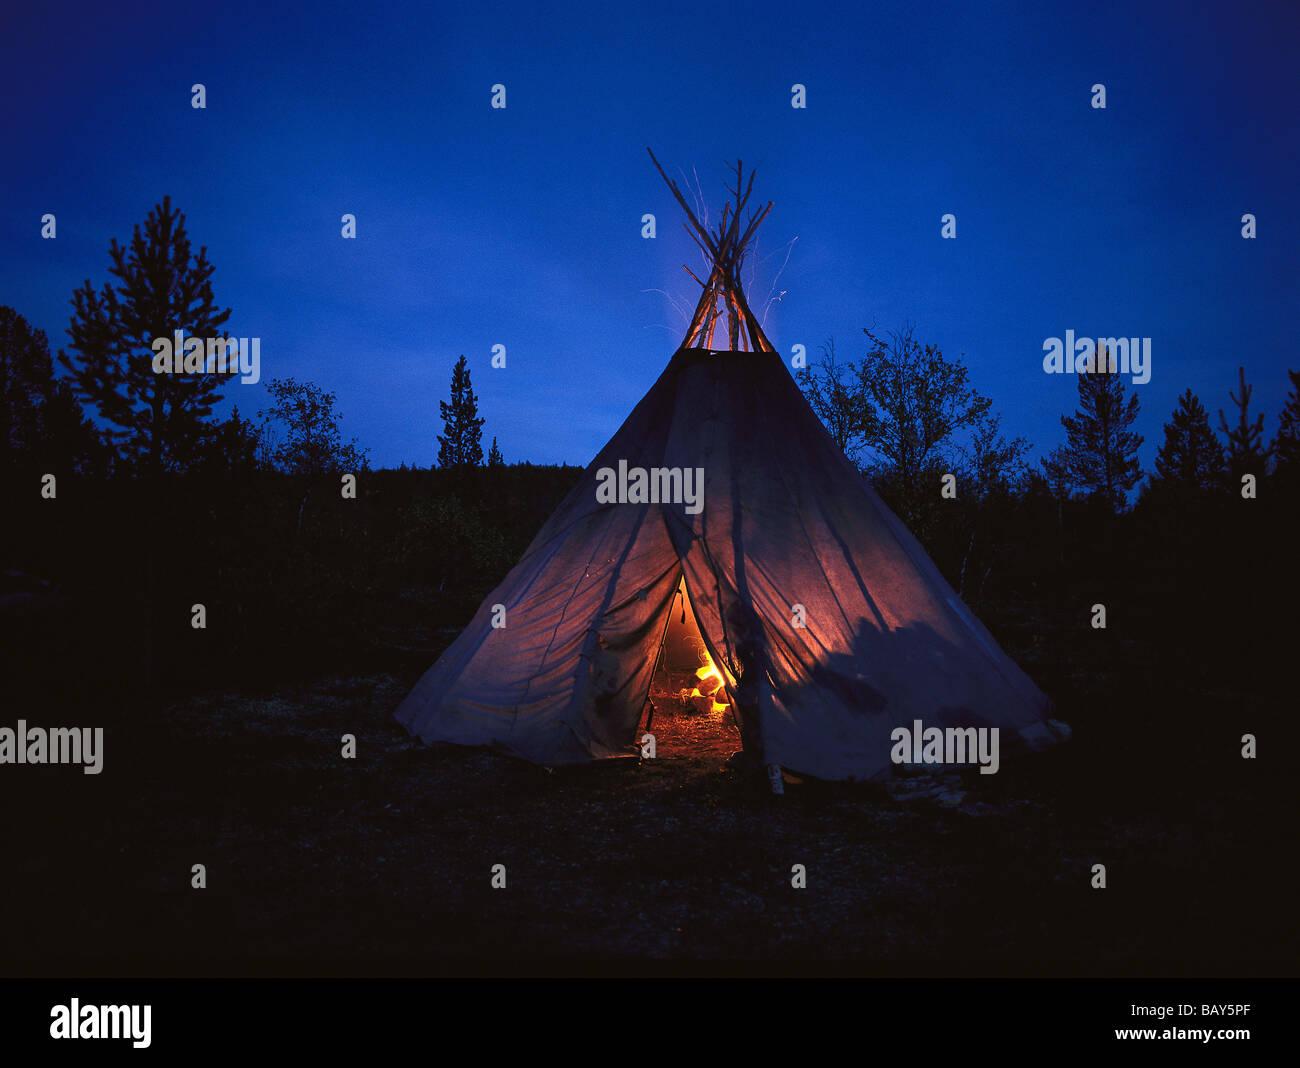 Tente, Bonfire, ambiance nocturne, Laponie, Finlande, Europe Photo Stock